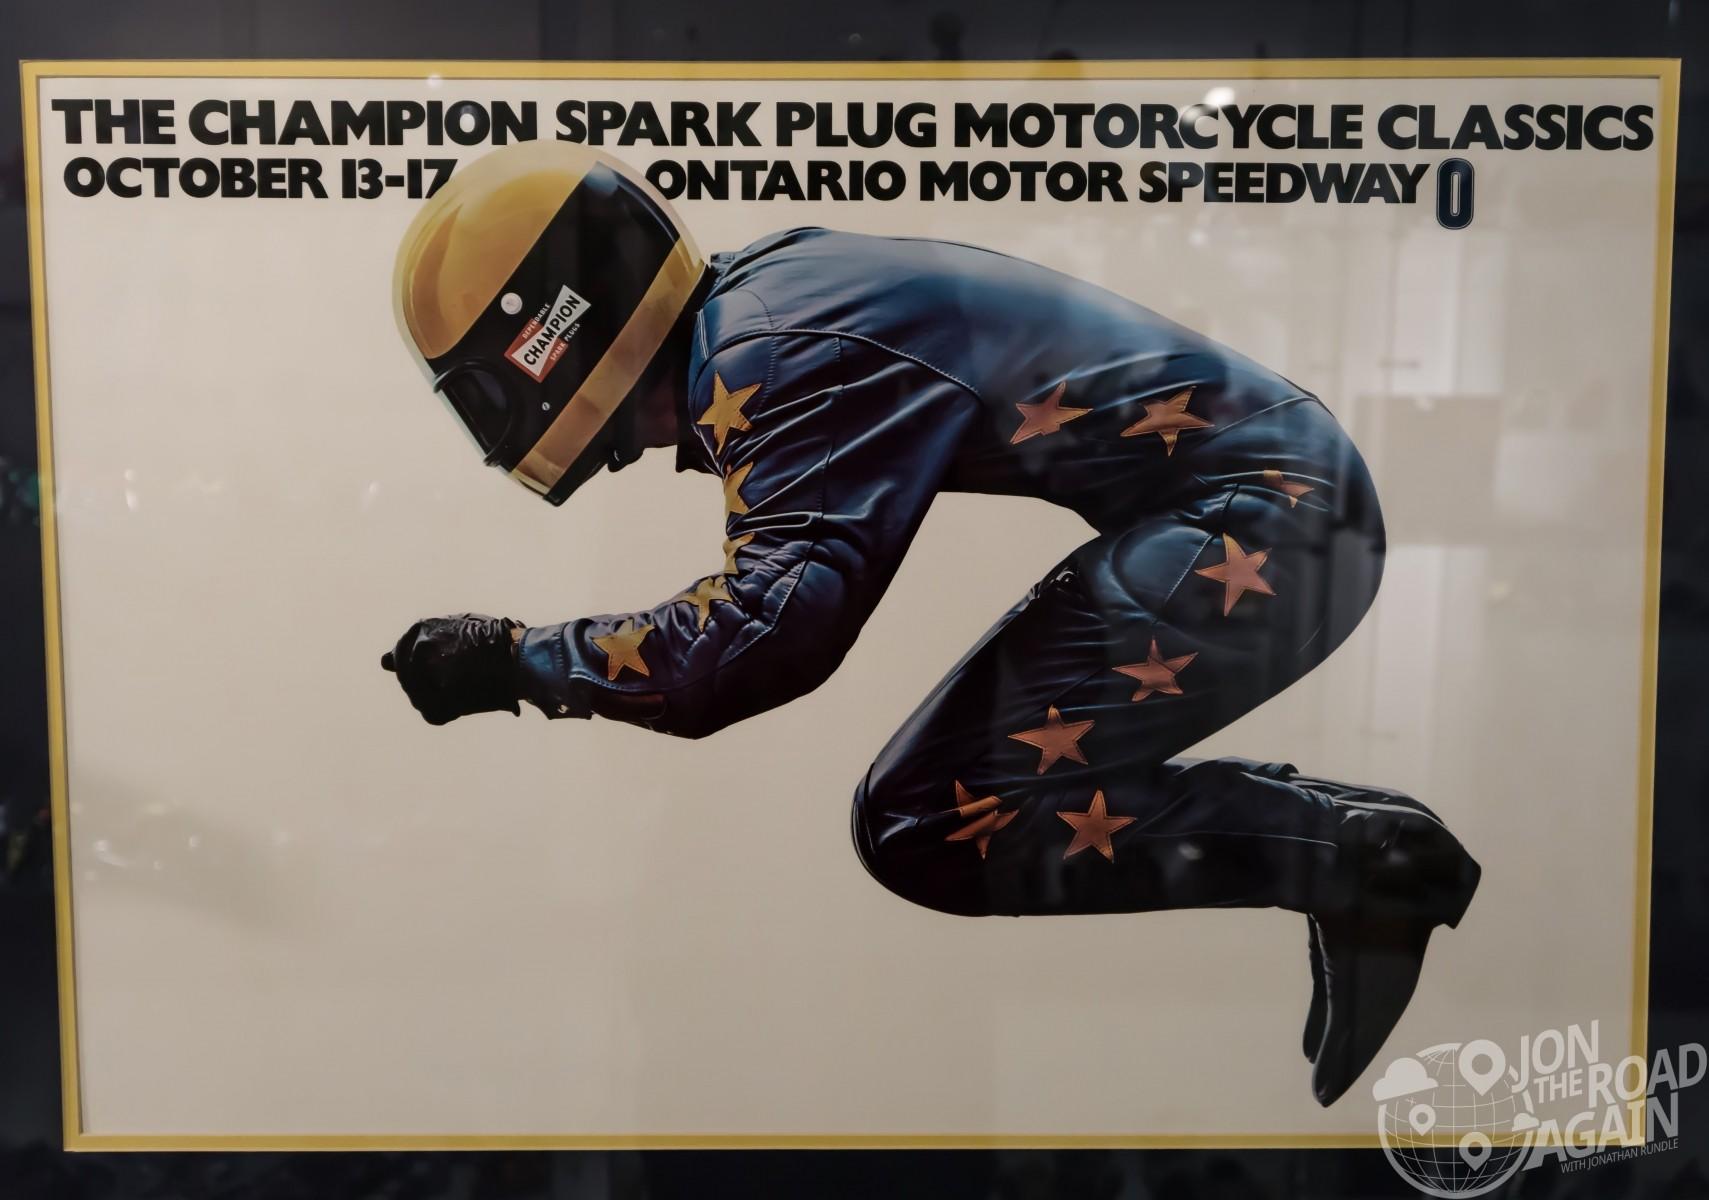 Champion Spark Plug Motorcycle Classics Poster